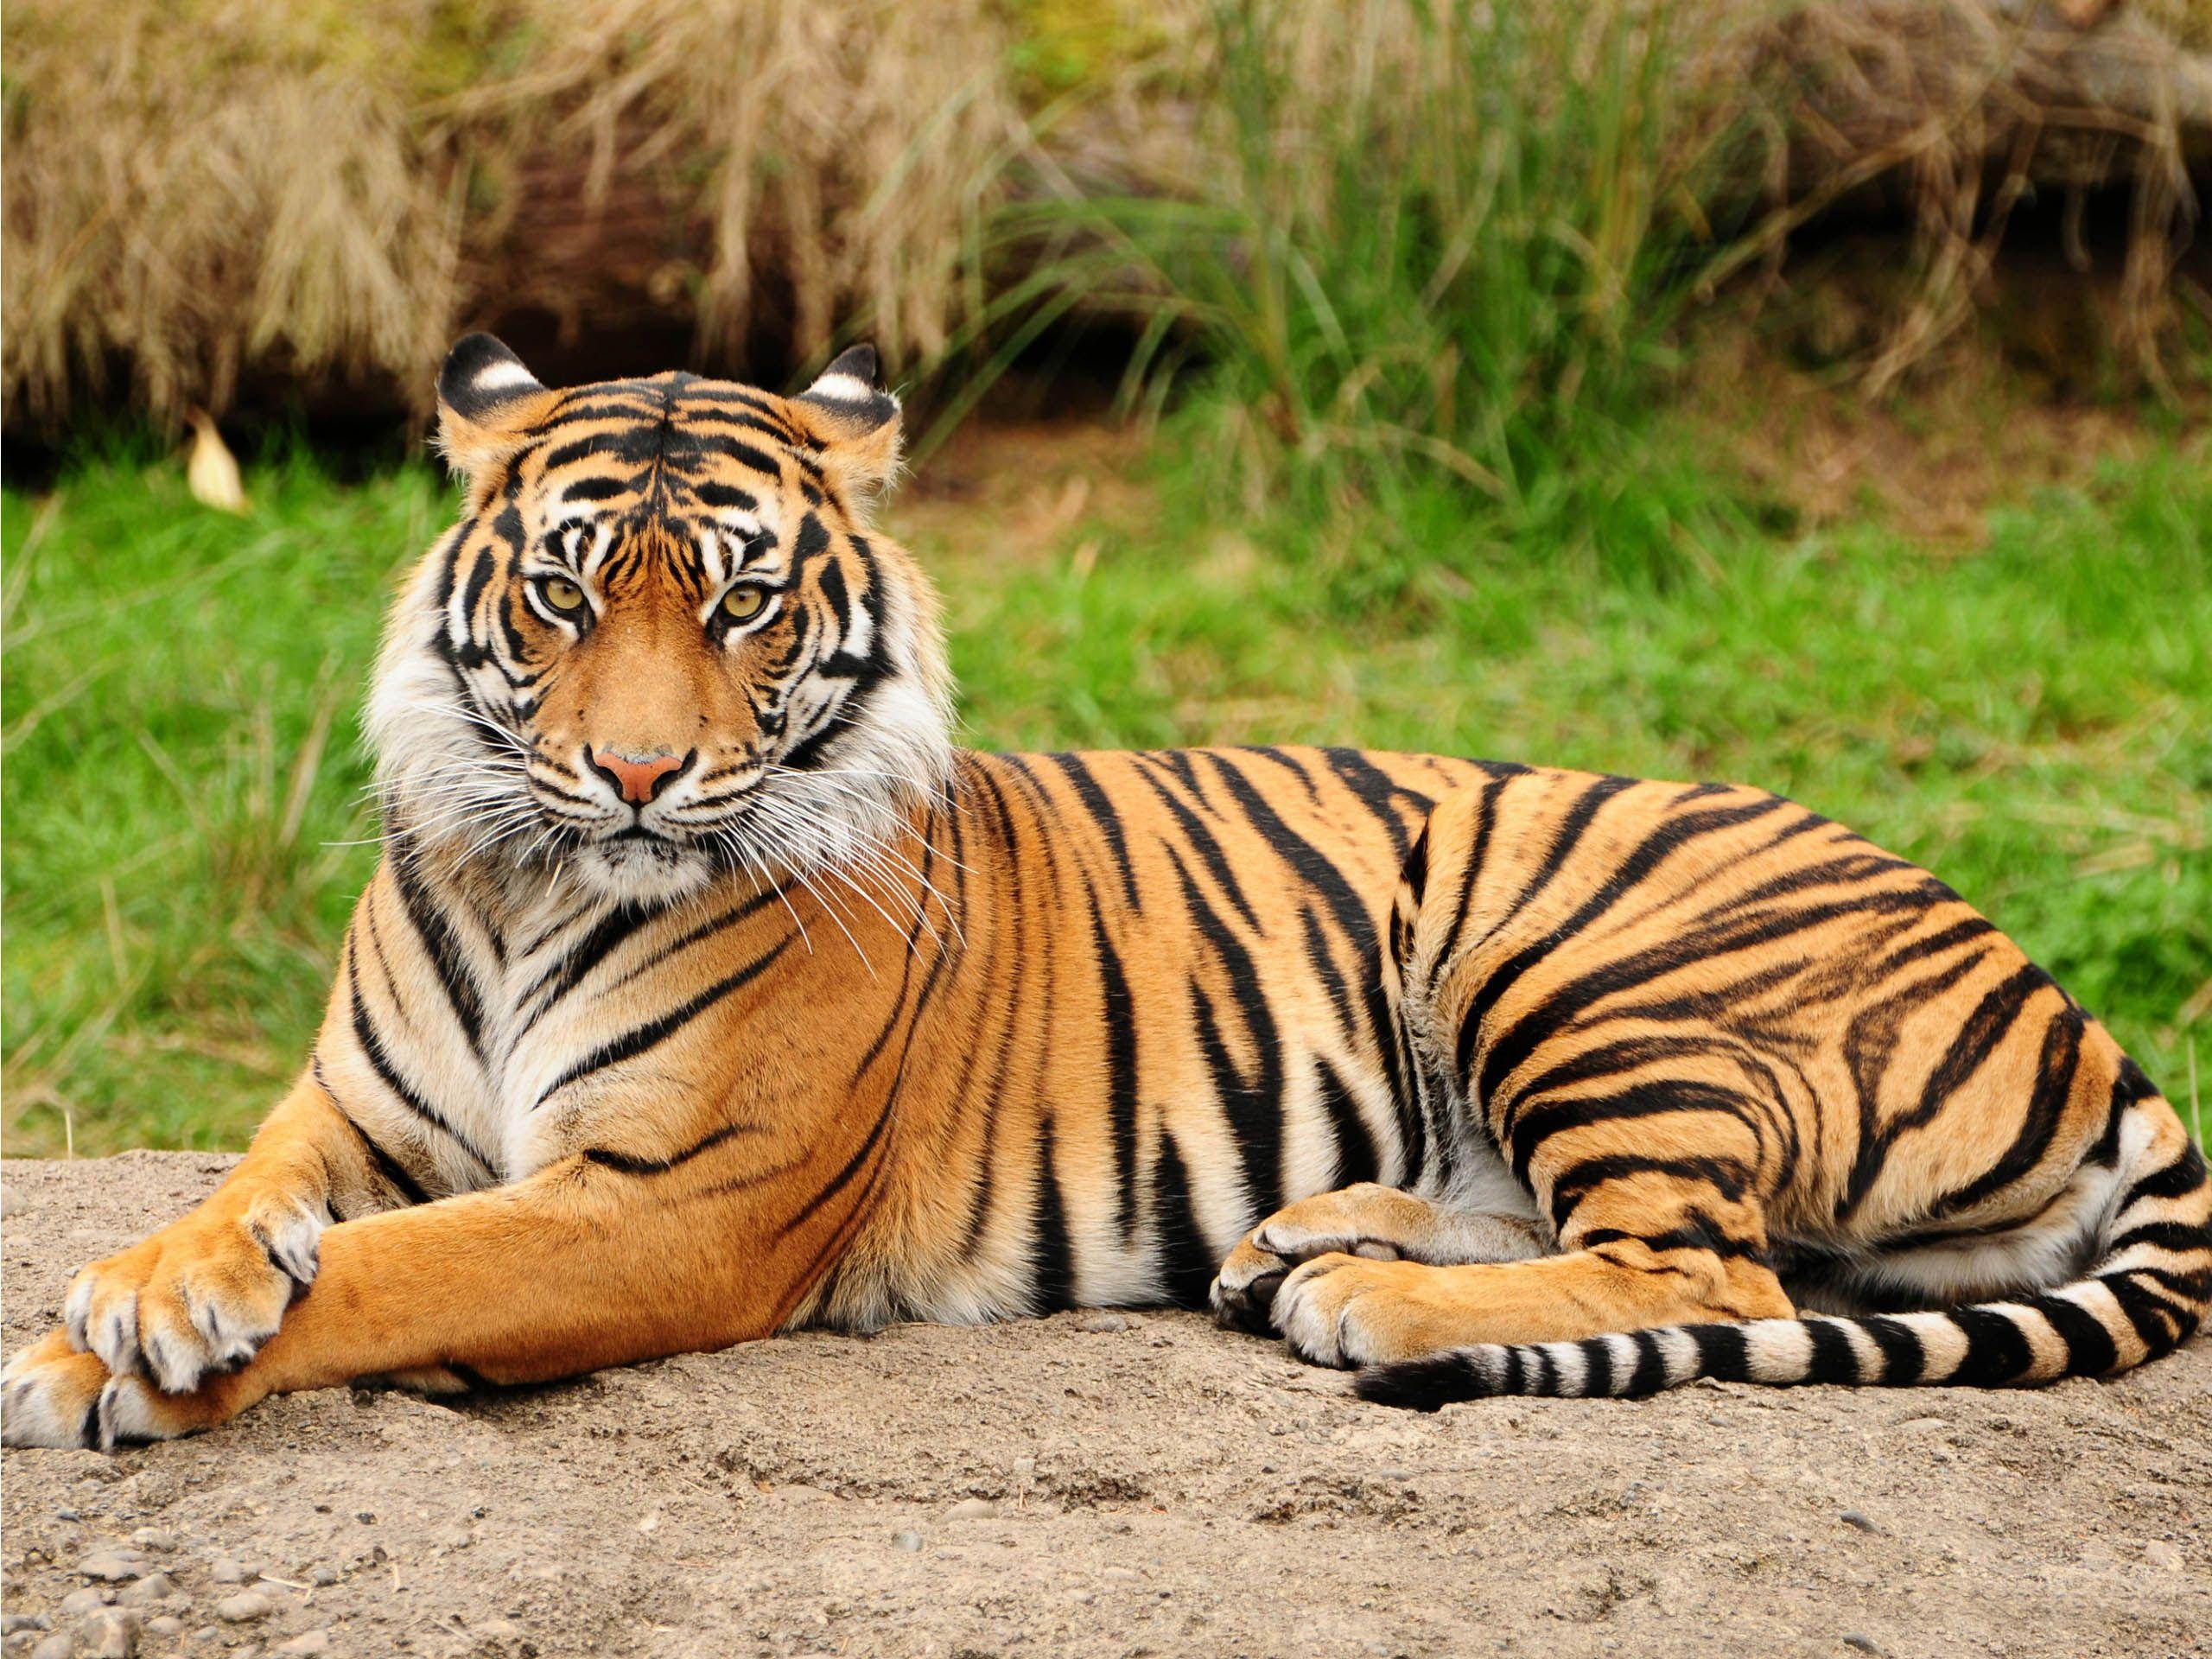 Tiger #02 Image Tiger #03 Image ...